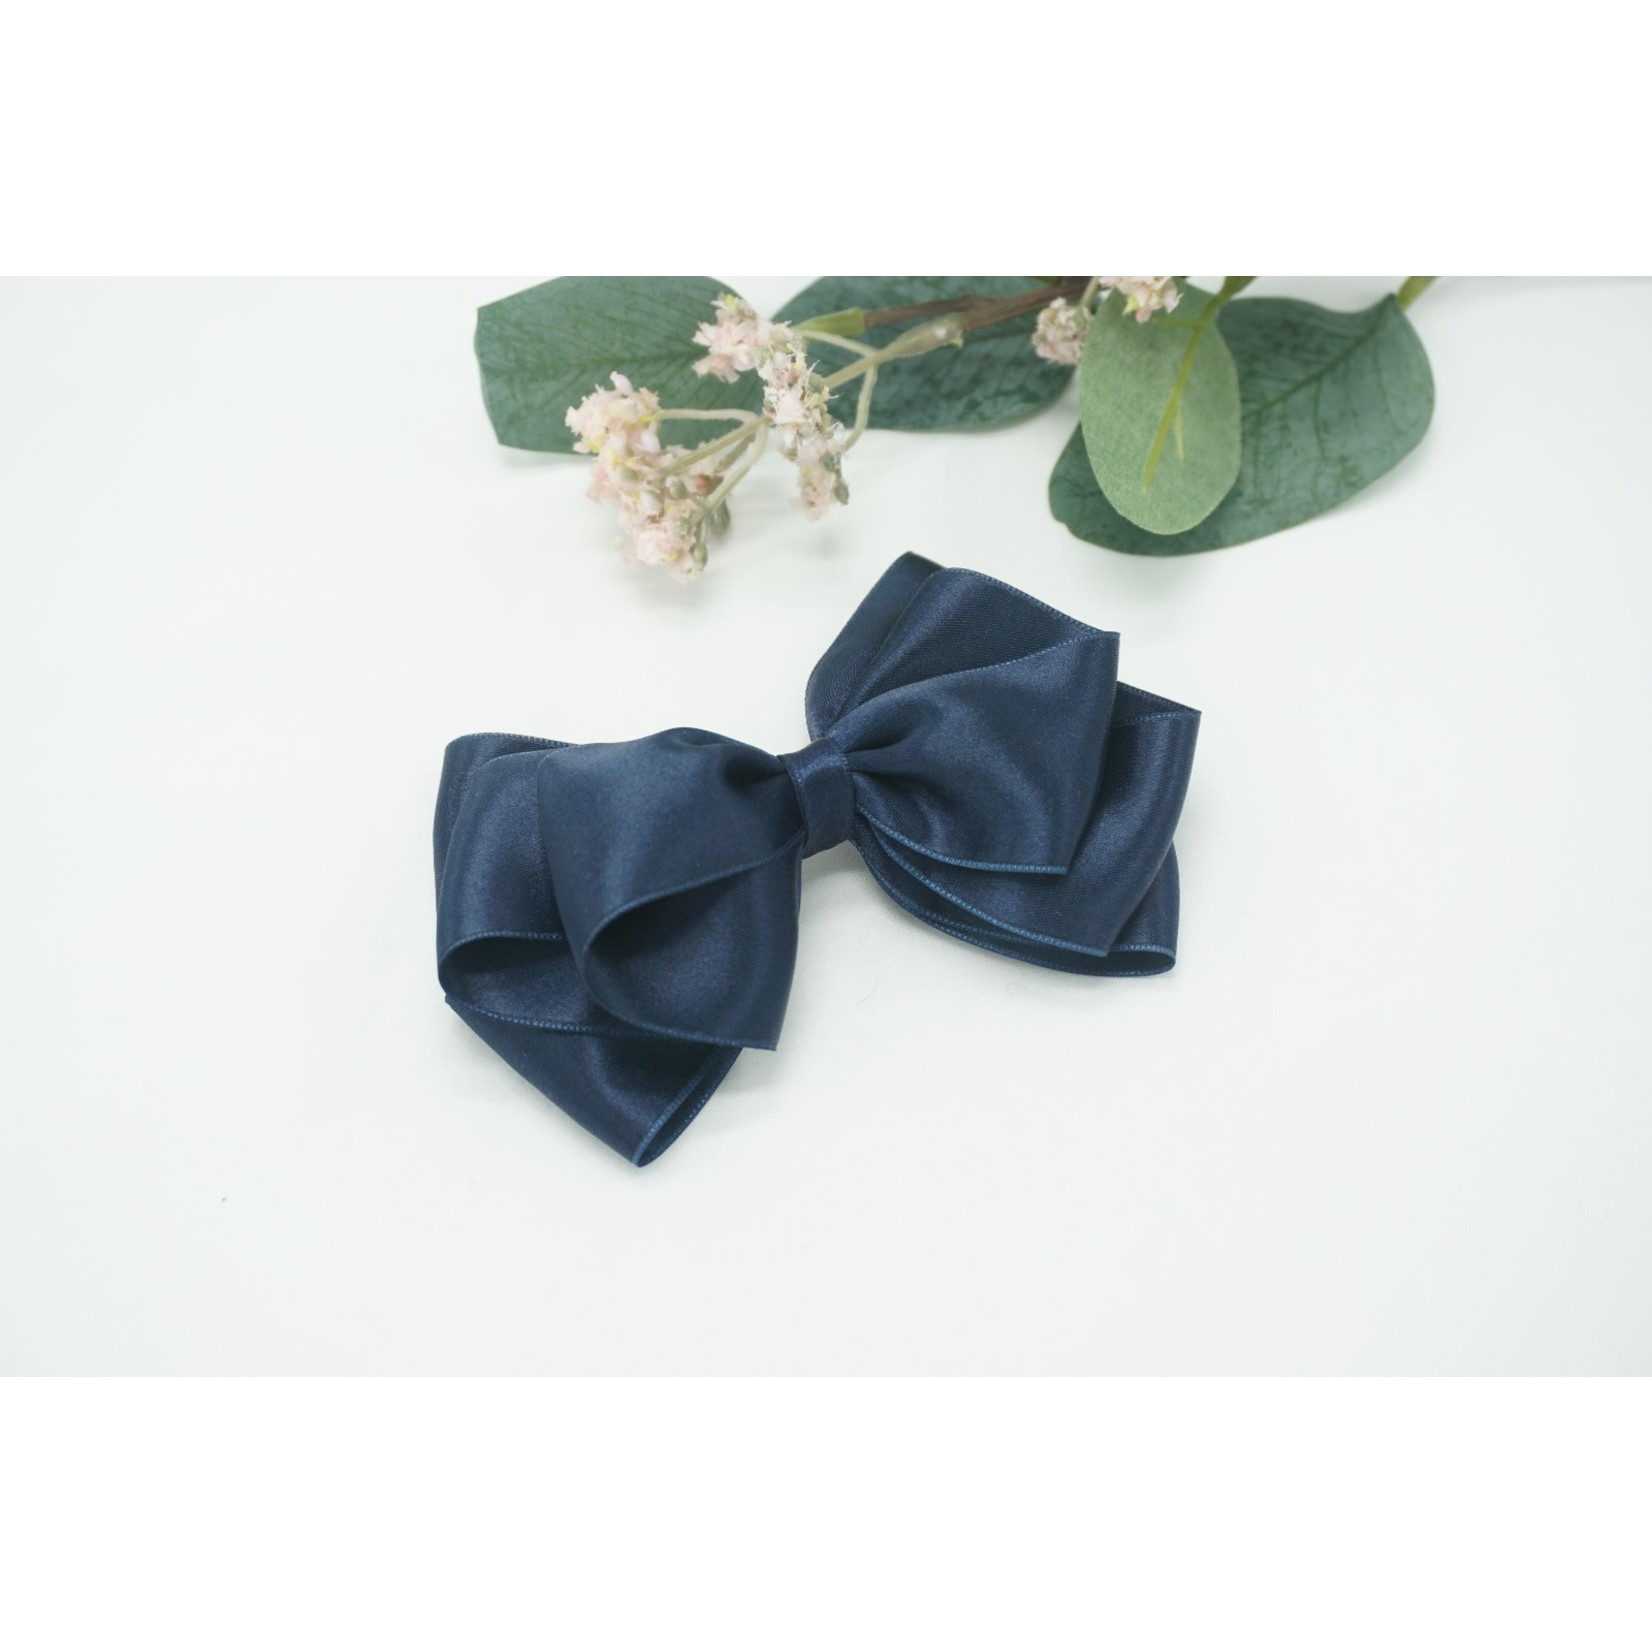 Petite Zara Butterfly Bow - Navy 12cm